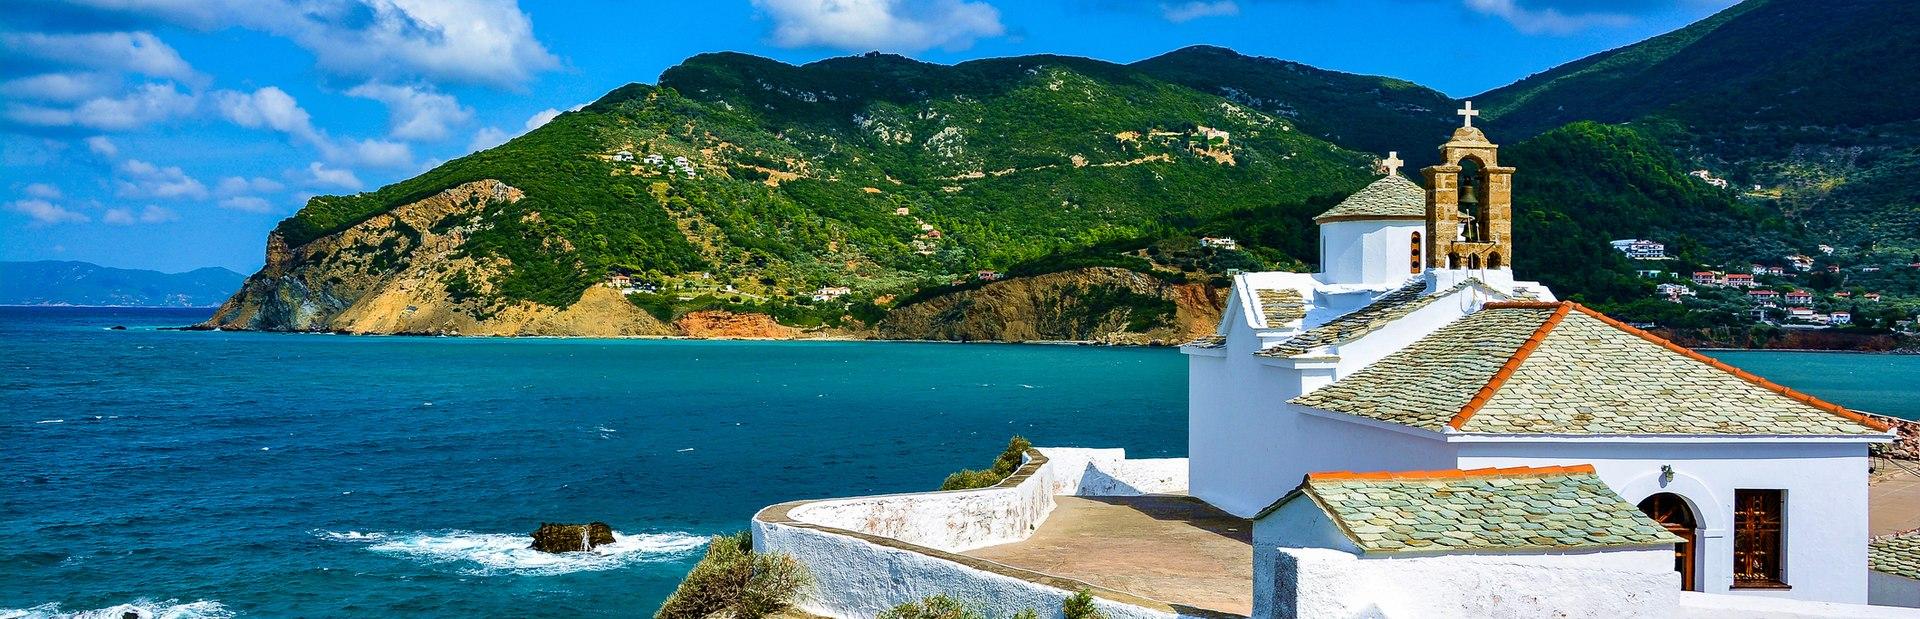 Discovering Skopelos: The World's Secret Superyacht Hotspot